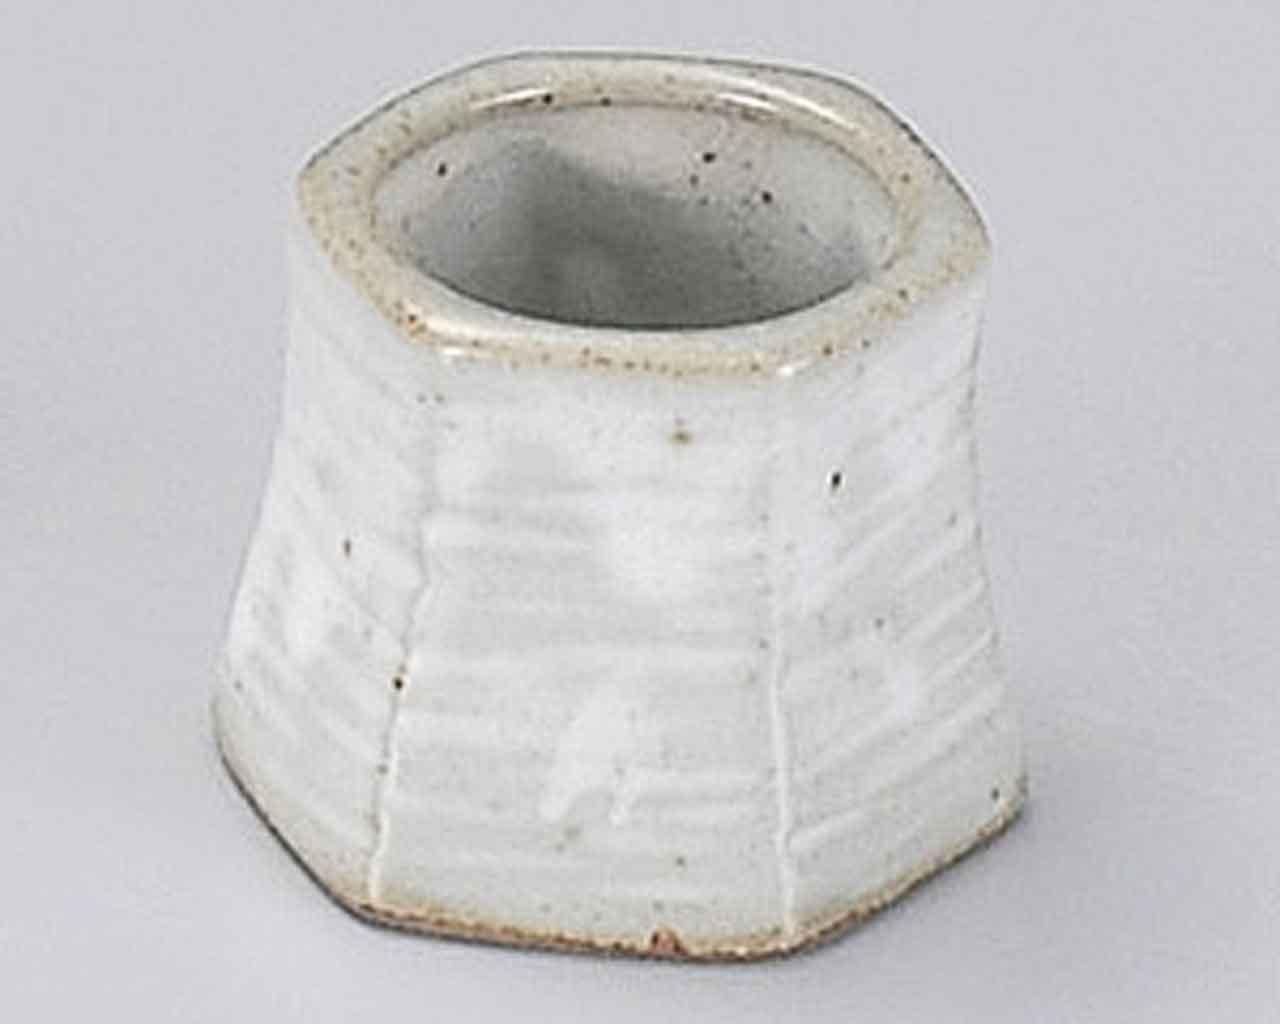 Kobiki Seiji 2inch Set of 5 Toothpick holders Grey Ceramic Made in Japan by Watou.asia